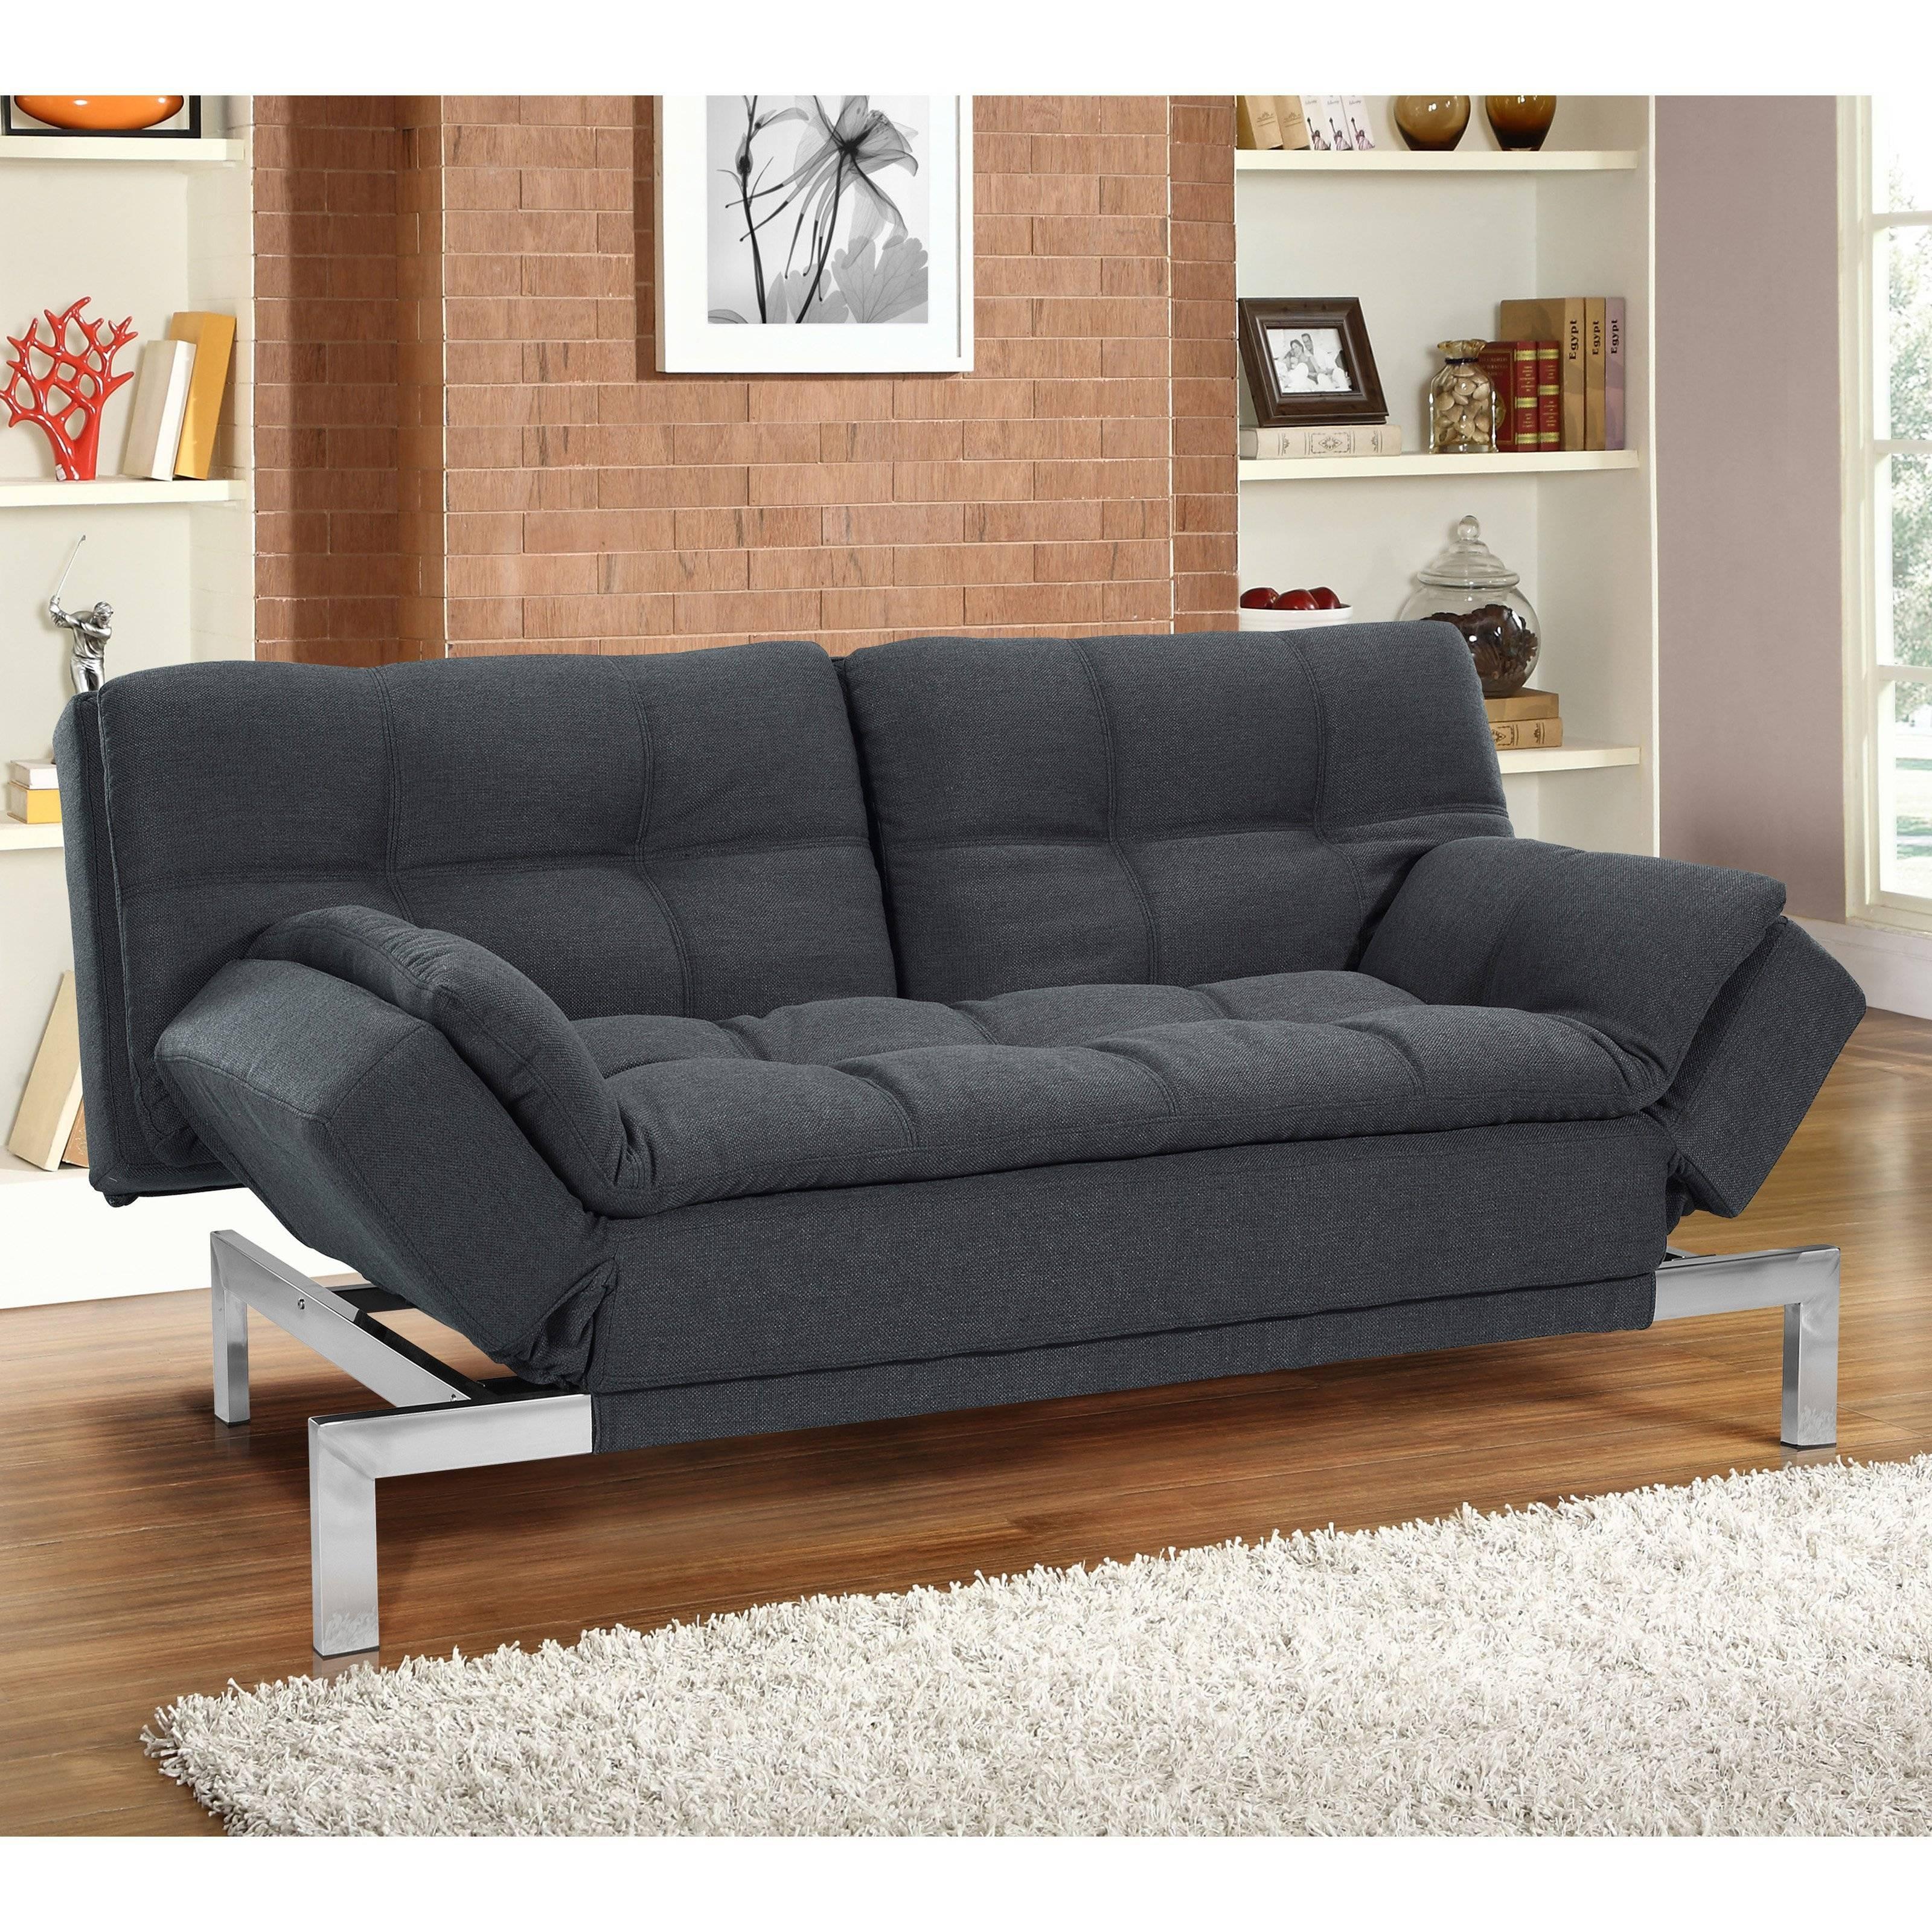 ▻ Sofa Bed : Thankful Euro Lounger Sofa Bed Homelegance Drake in Euro Lounger Sofa Beds (Image 15 of 15)